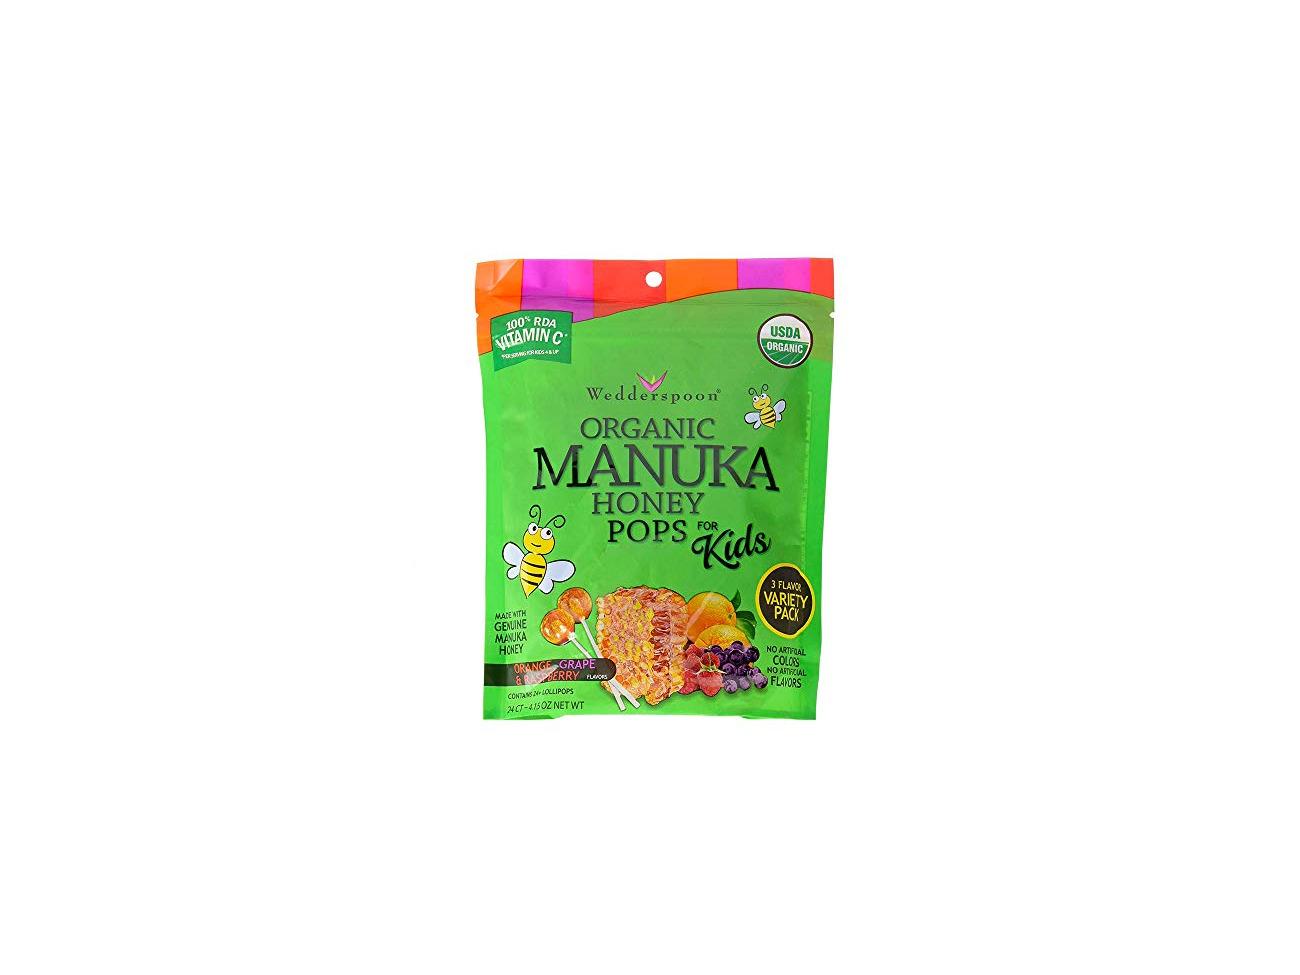 Buy Wedderspoon Organic Manuka Honey Pops For Kids